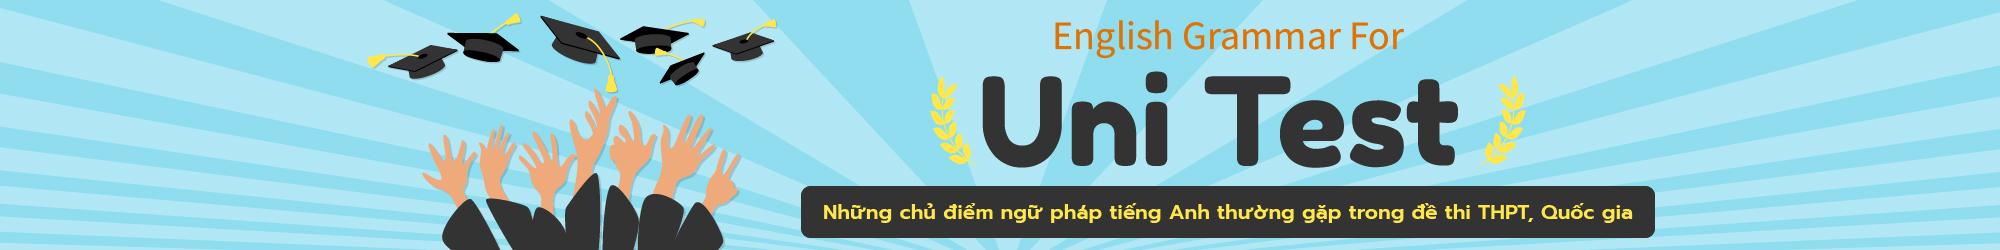 ENGLISH GRAMMAR FOR UNI TEST banner